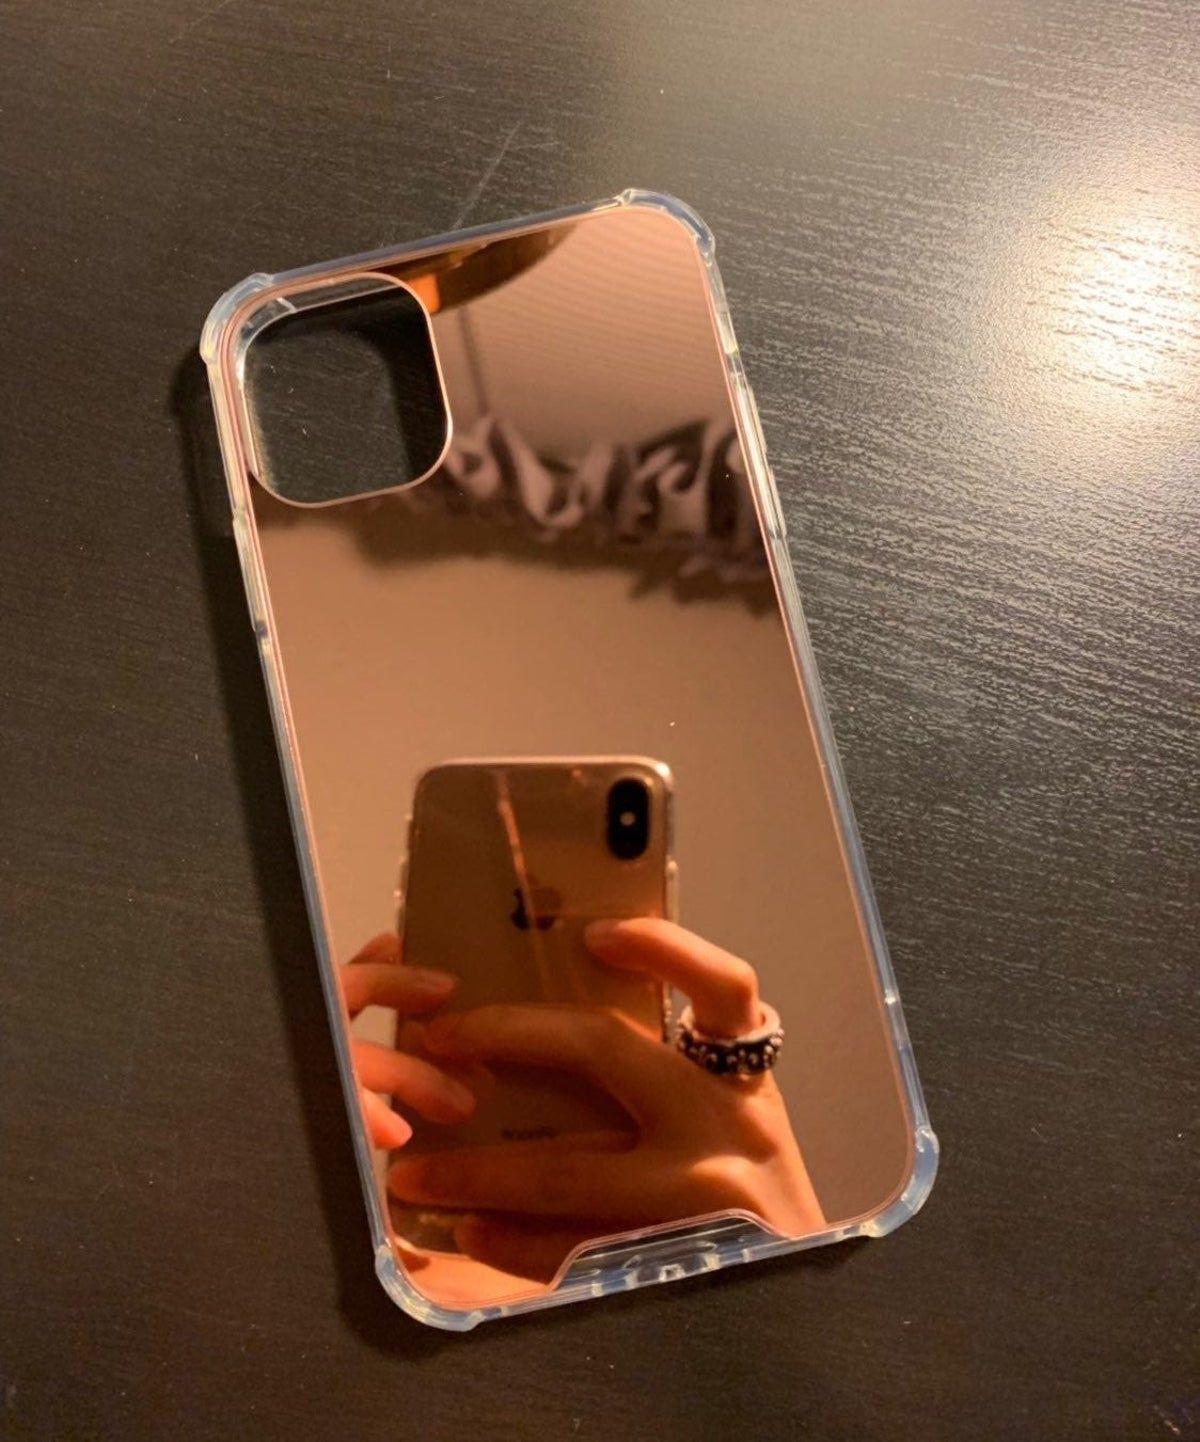 Iphone 11 Rose Gold Mirror Phone Case In 2020 Rose Gold Phone Case Print Phone Case Gold Phone Case